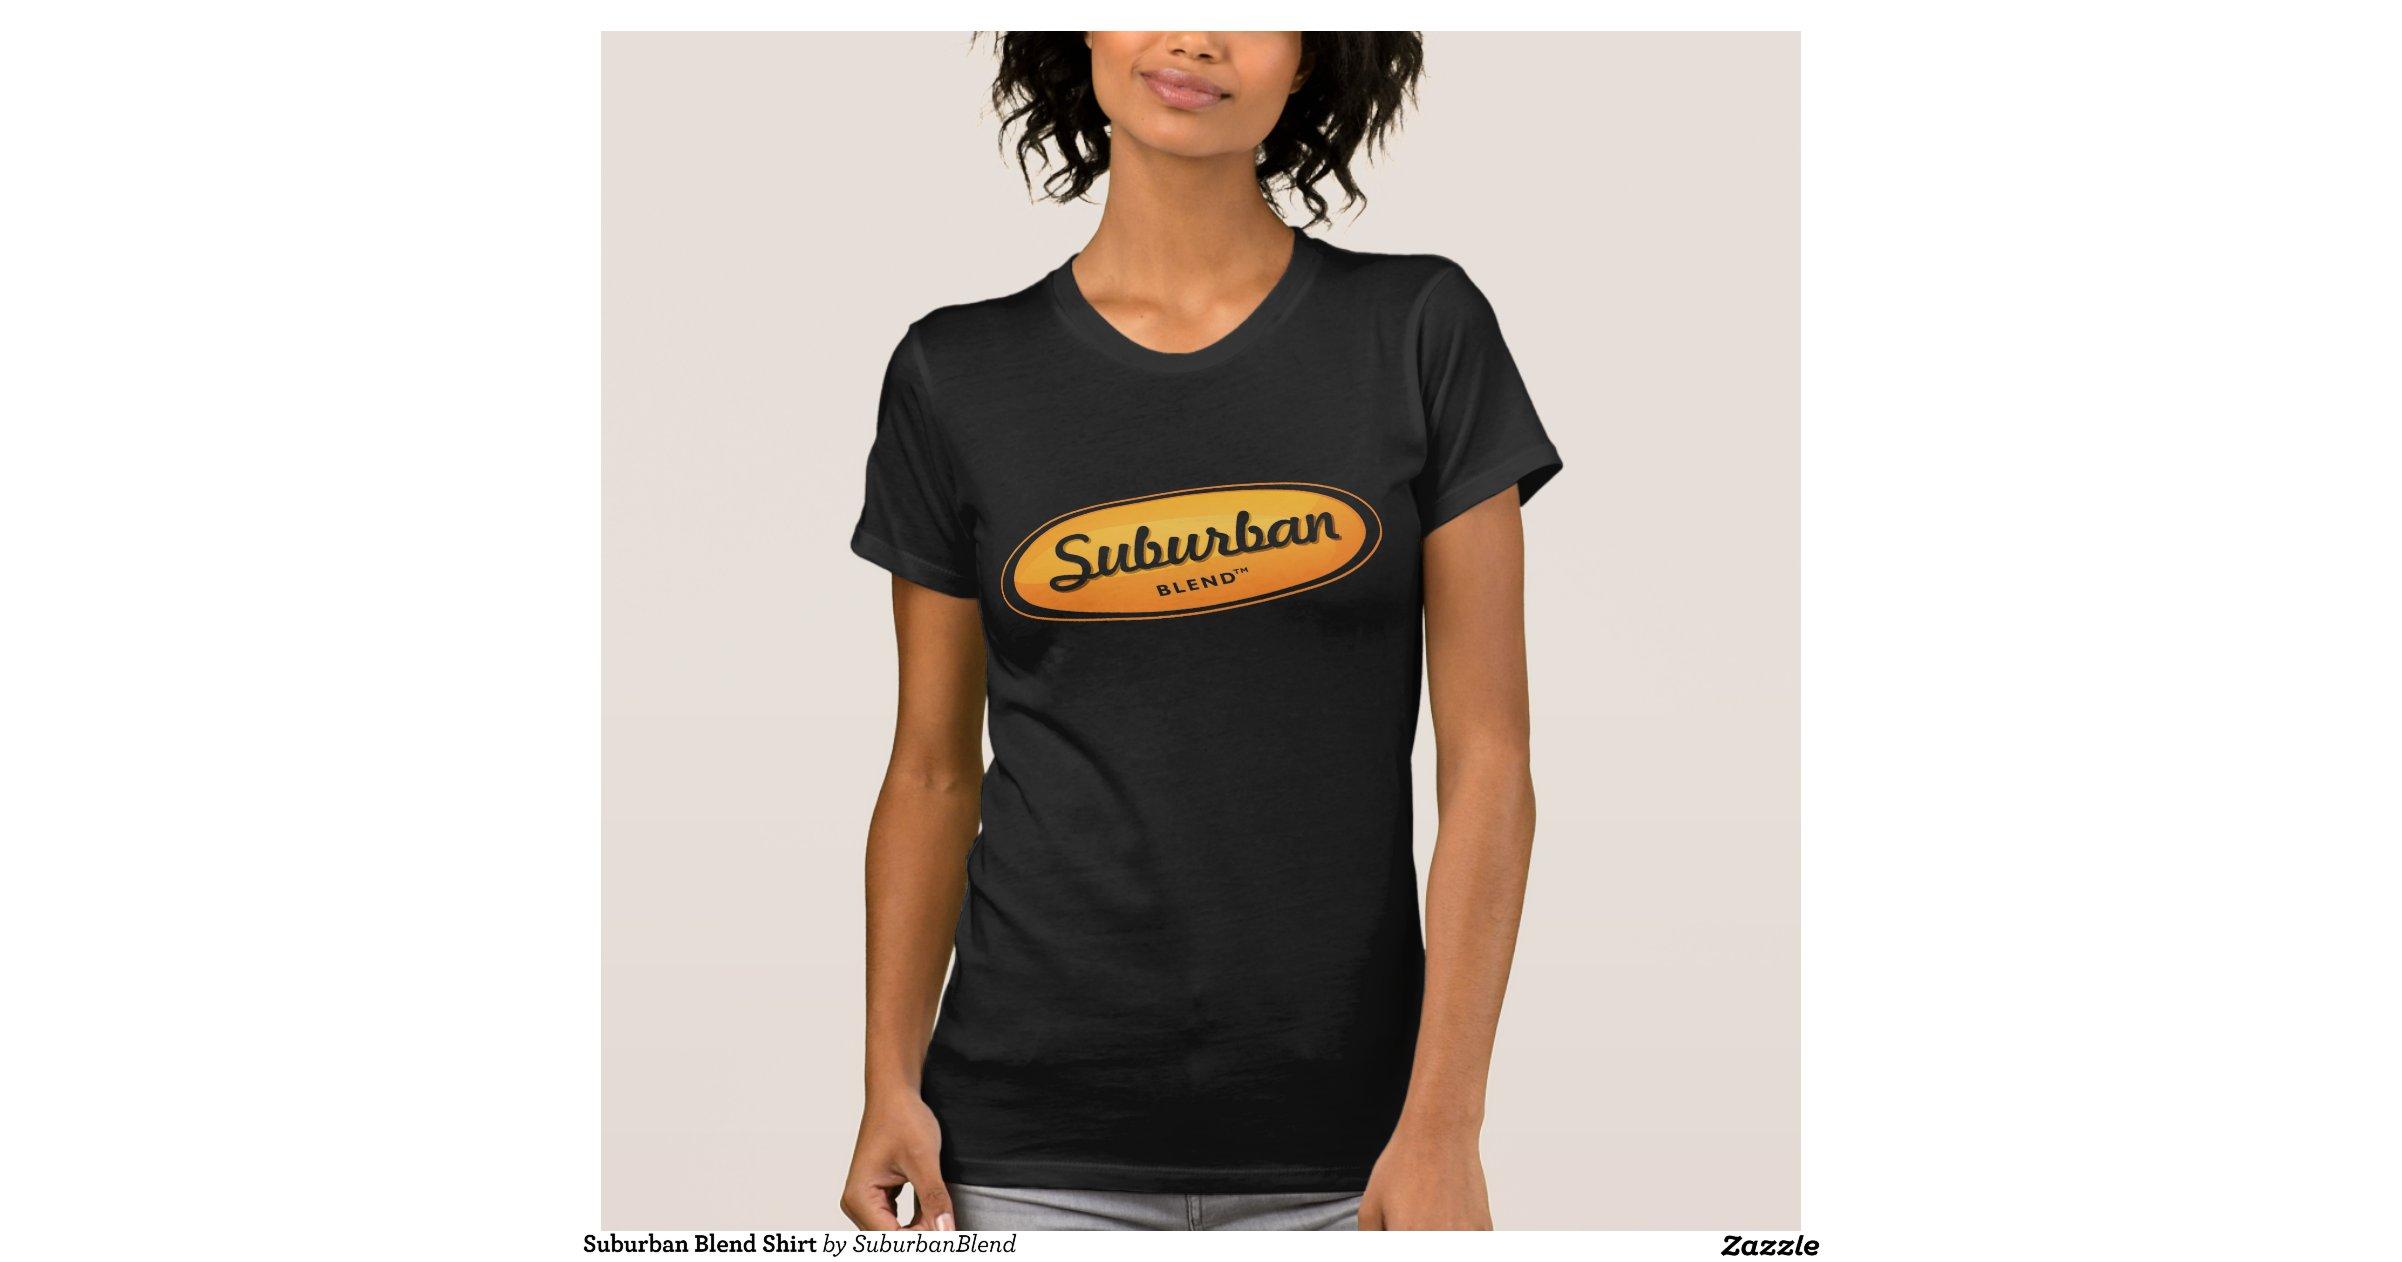 Suburban Blend Suburban Blend Shirt   Zazzle